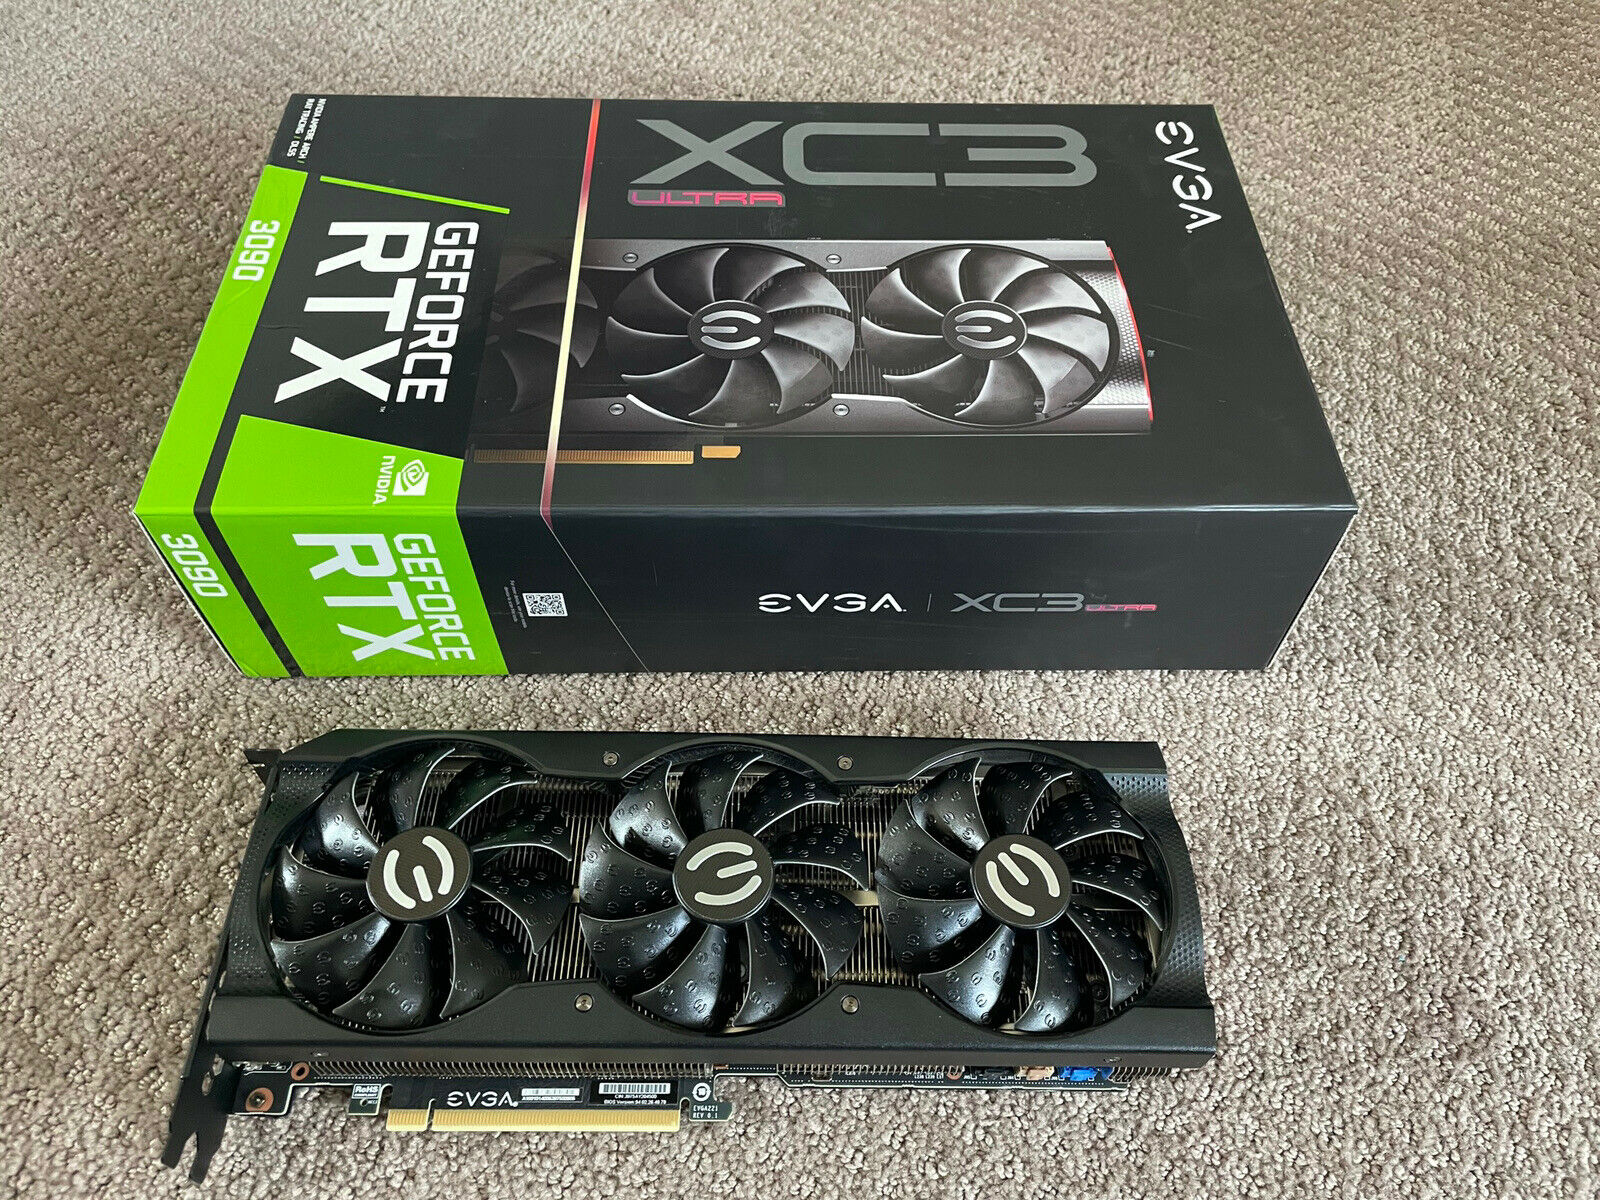 GEFORCE RTX 3090 / RTX 3080 / RTX 3070 / RTX 3060 Ti / RTX 3060 / RADEON RX 6900 XT / AMD Radeon RX 6800 XT / Radeon RX 6700 XT / Radeon RX 5700 XT